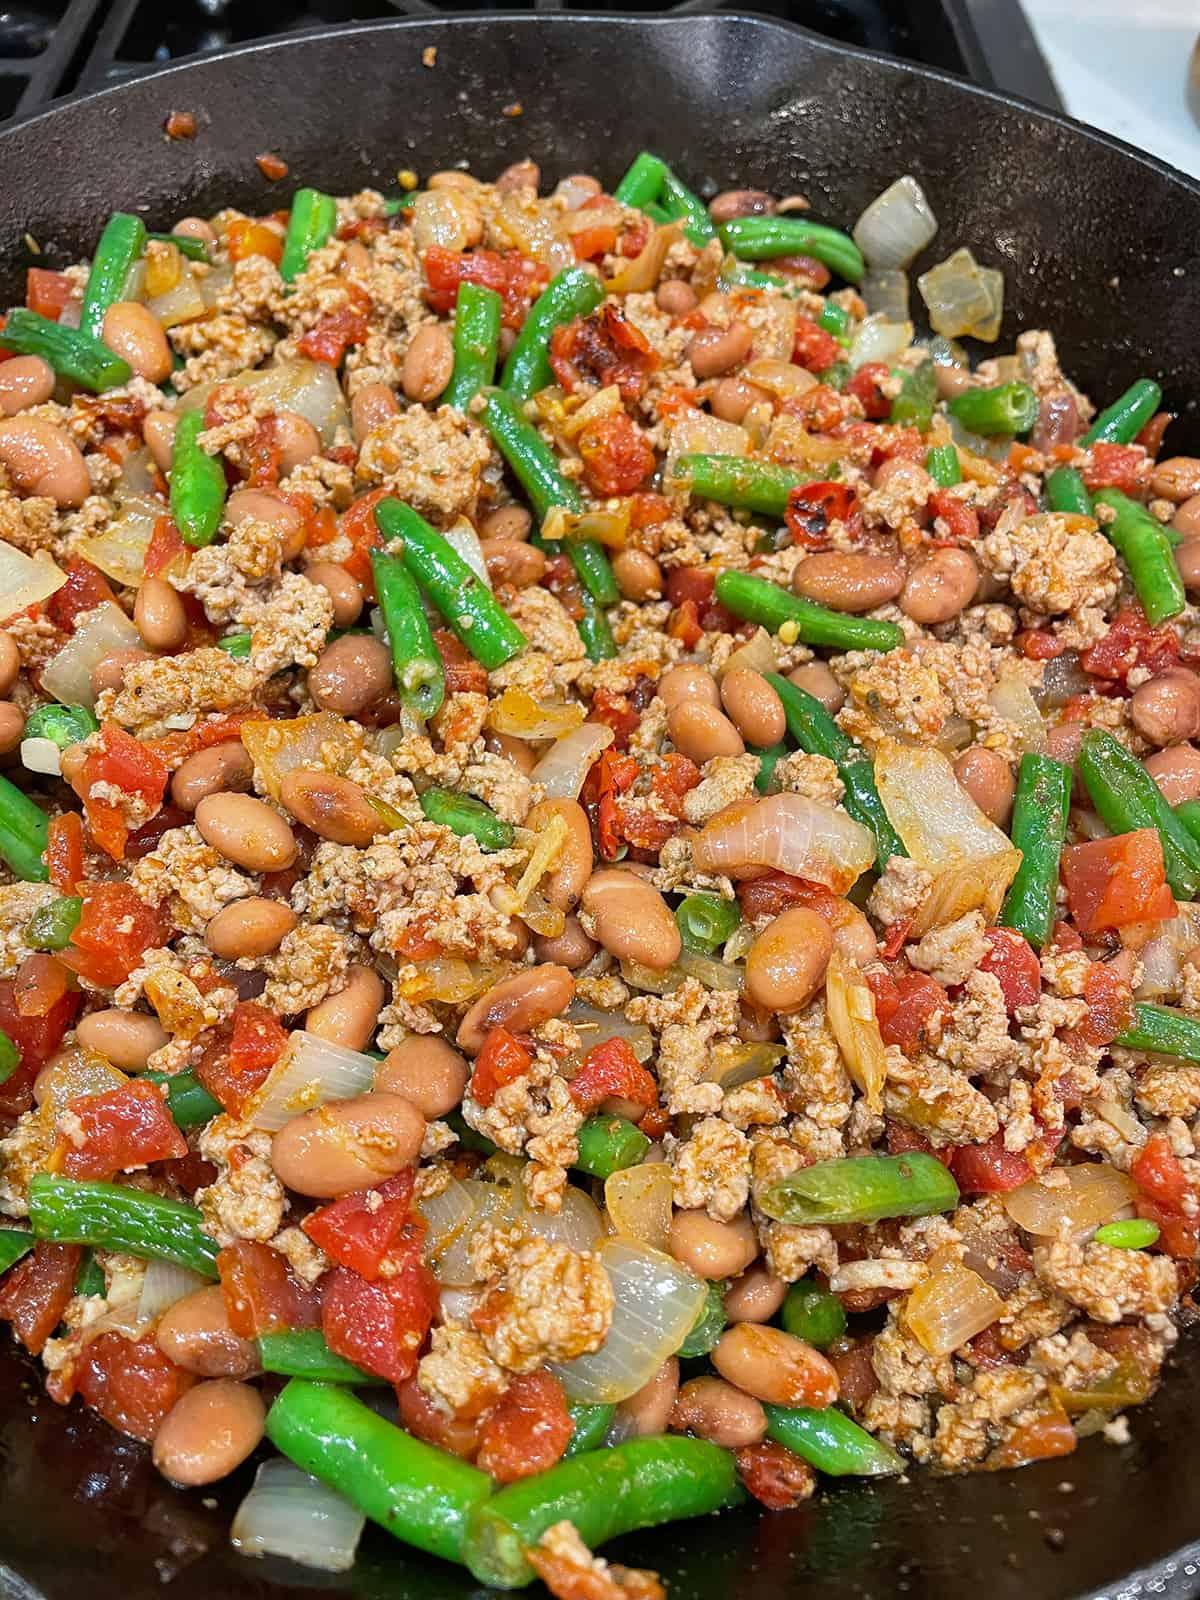 Healthy ingredients cooking in a pan